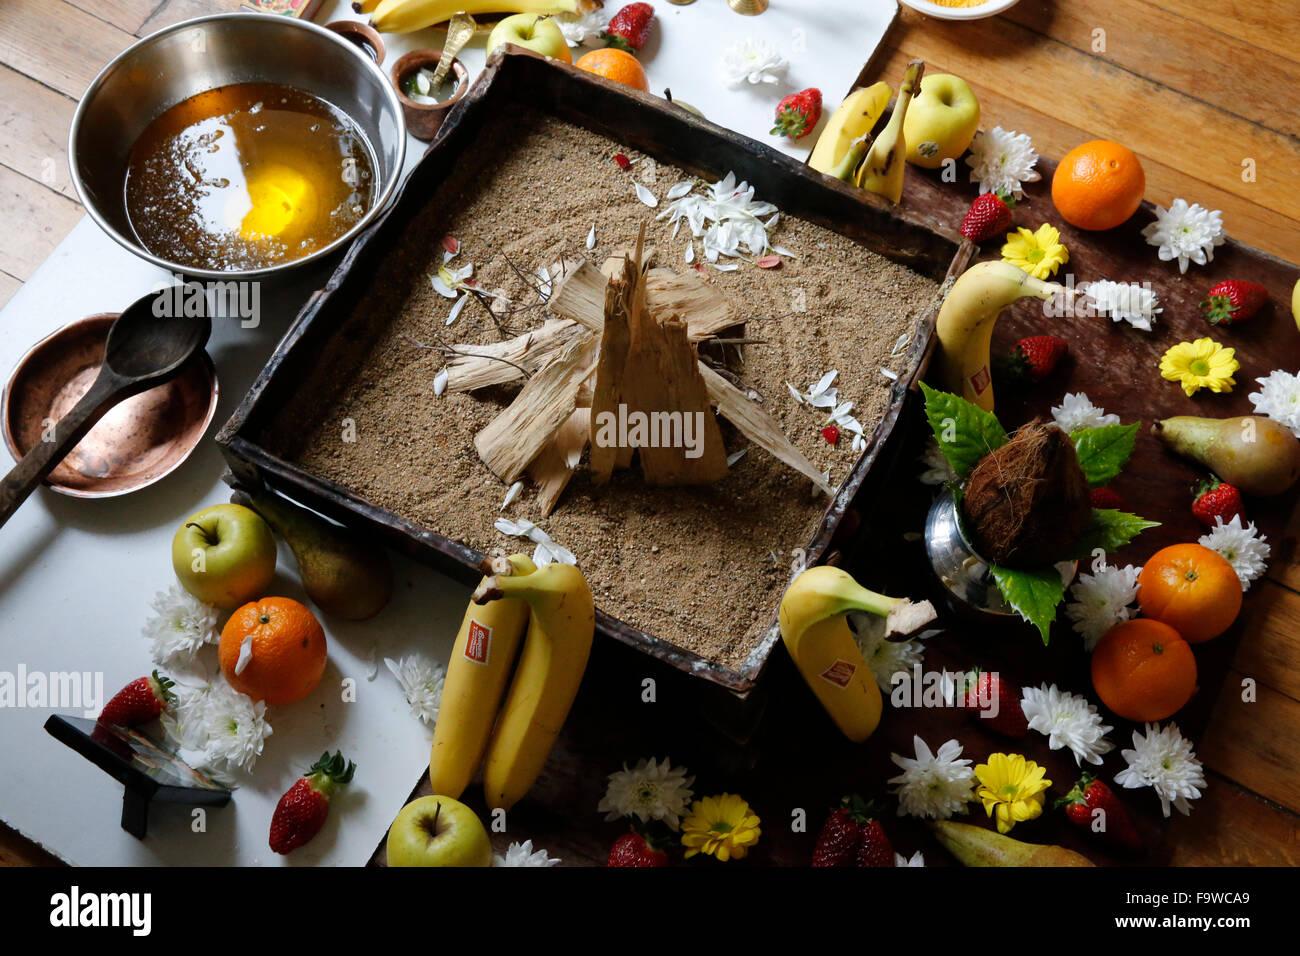 Ramnavami stock photos ramnavami stock images alamy ramnavami celebration stock image forumfinder Gallery